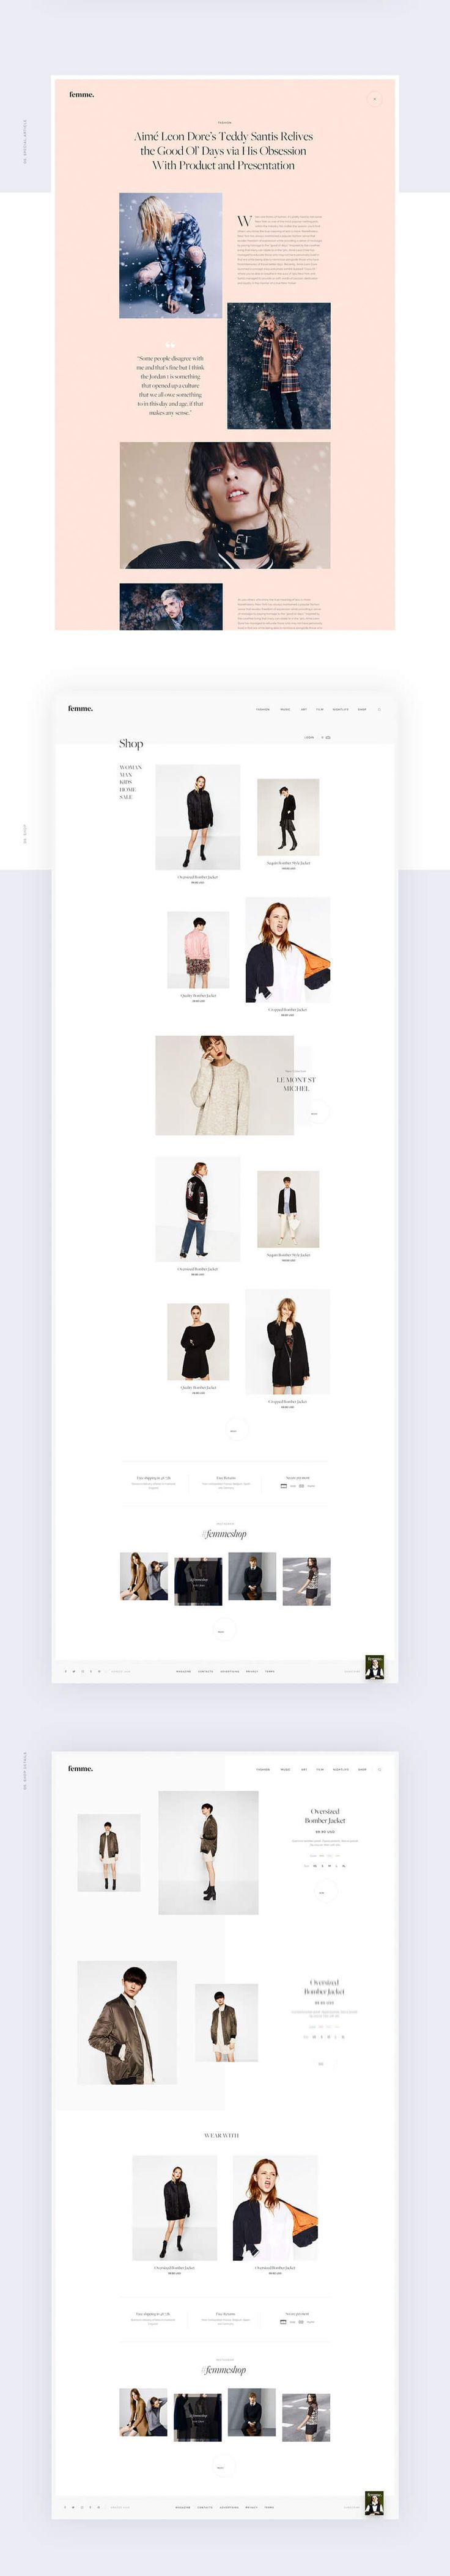 Femme4 #ui #ux #userexperience #website #webdesign #design